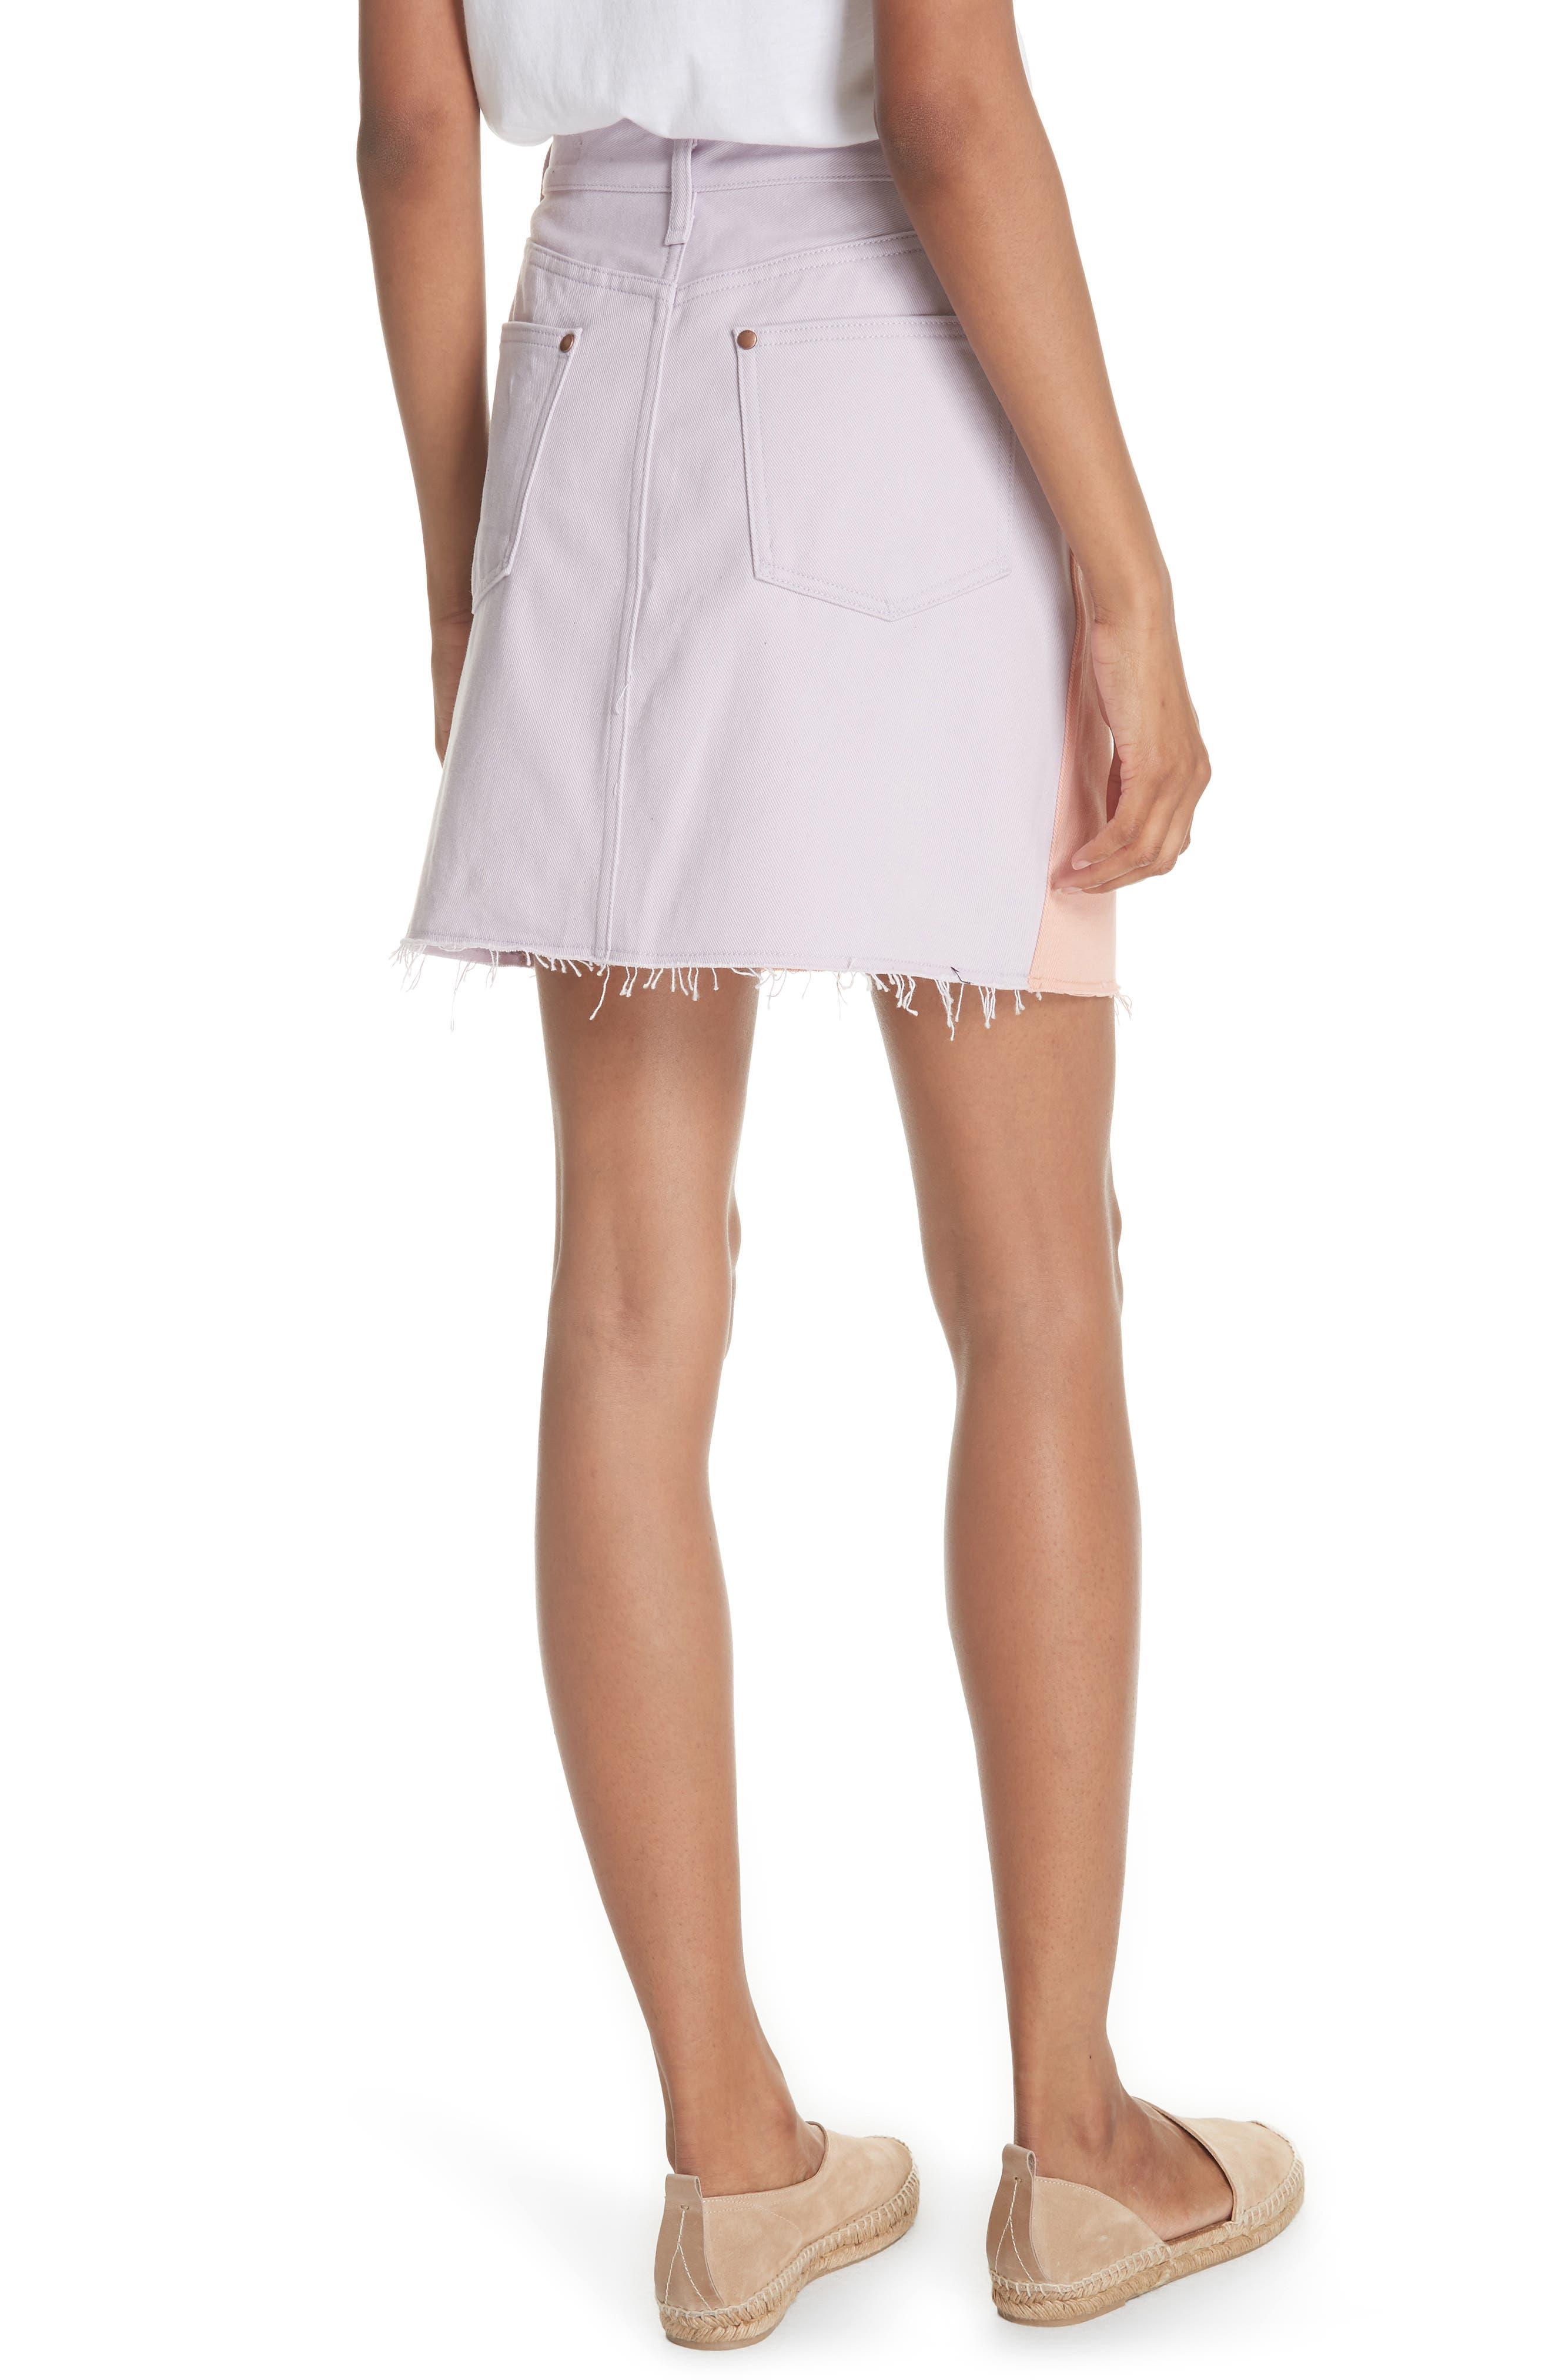 Moss Skirt,                             Alternate thumbnail 2, color,                             Peach/ Lilac